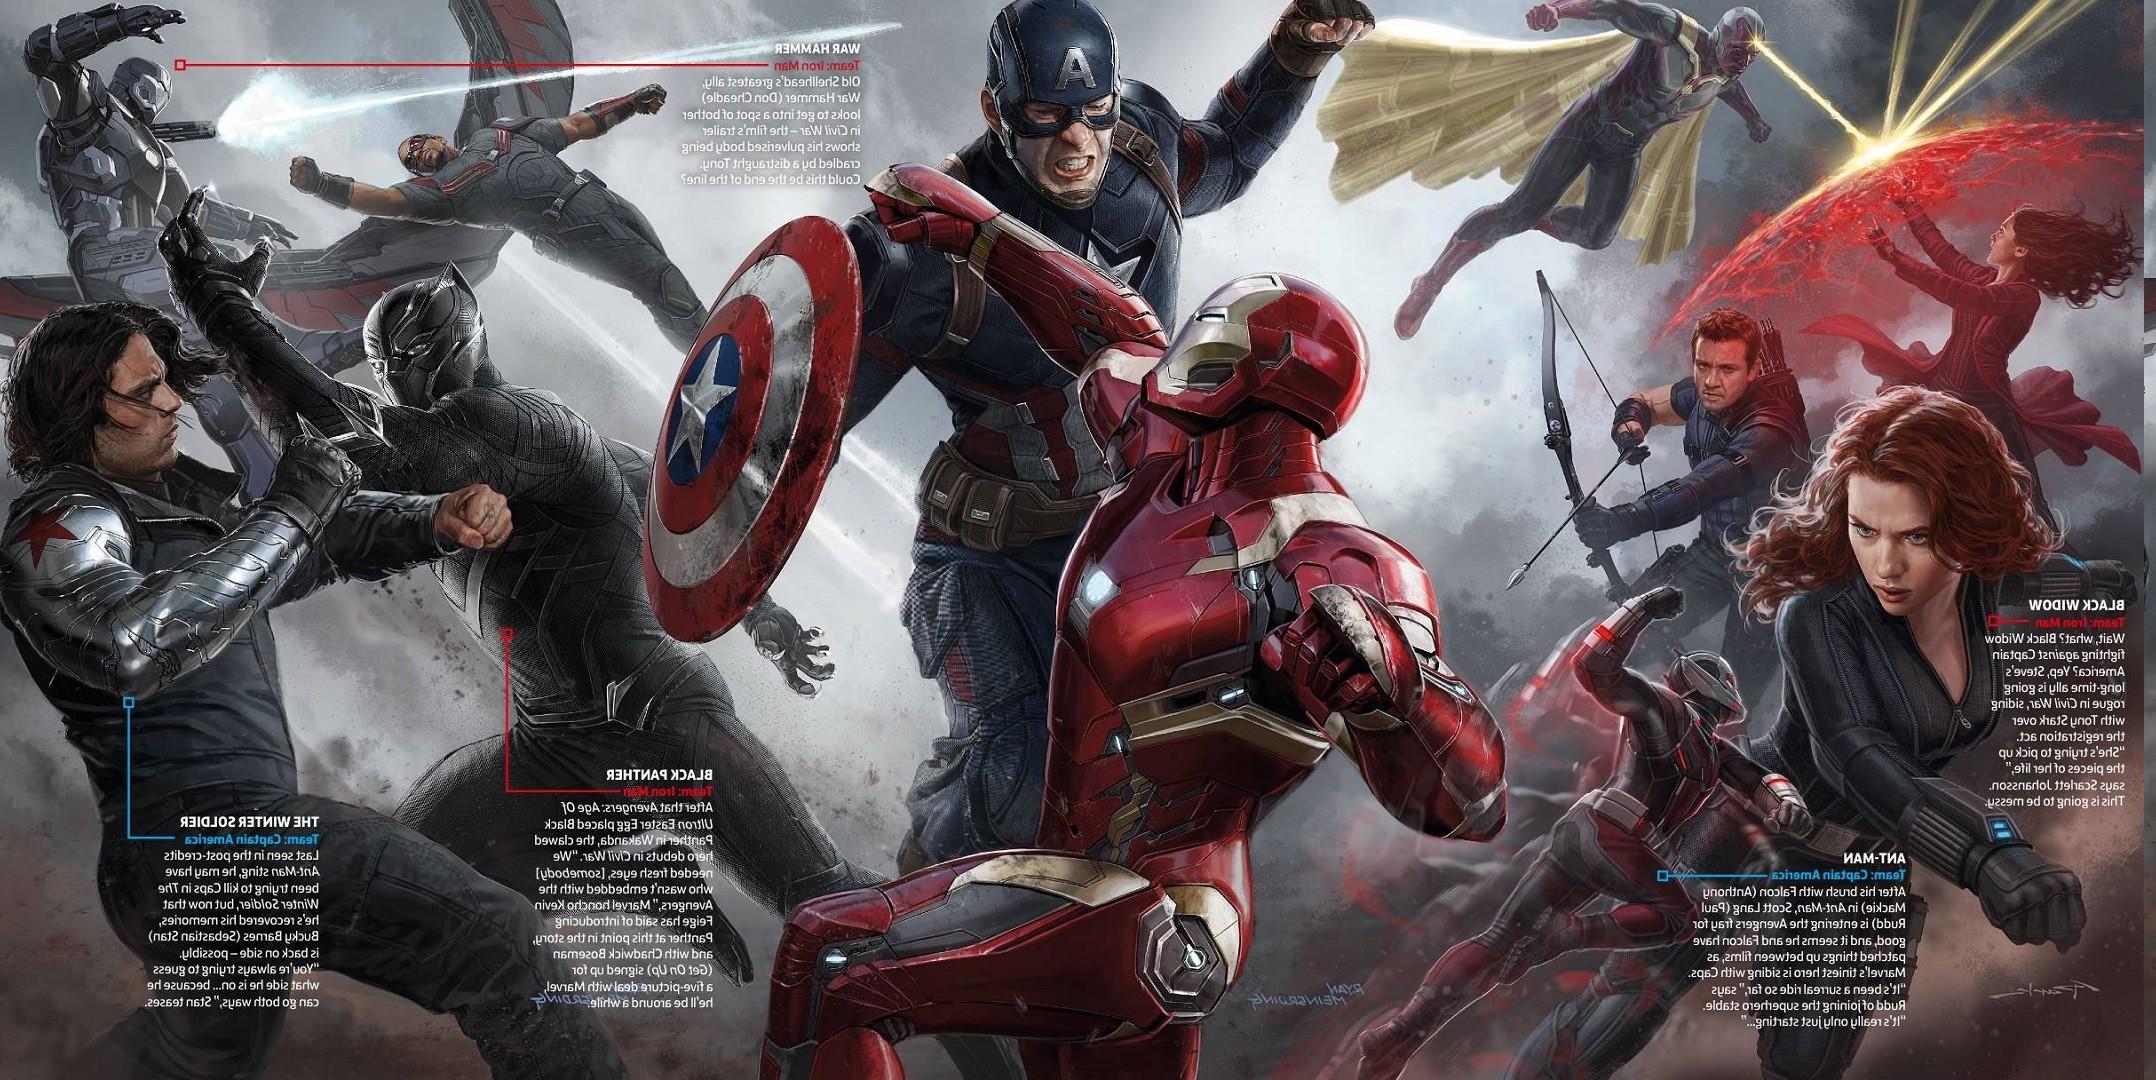 Captain America Captain America Civil War Iron Man Black Widow 2156x1080